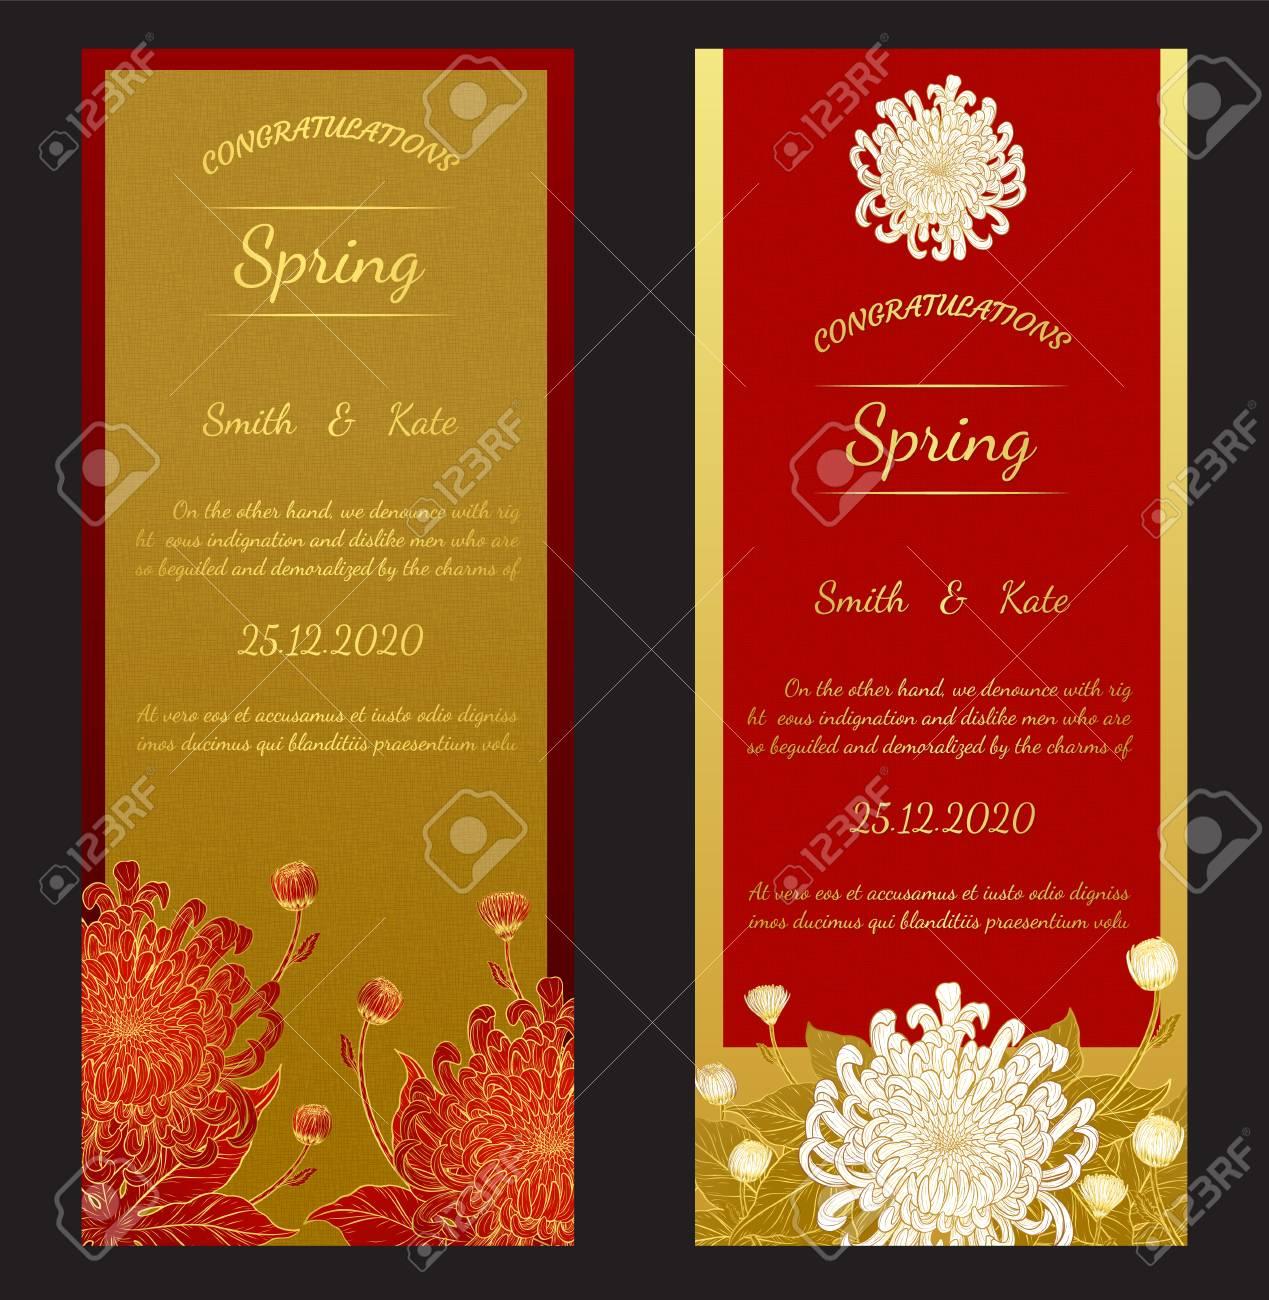 Chrysanthemum Vintage Card On Red Background.Chrysanthemum Flower ...